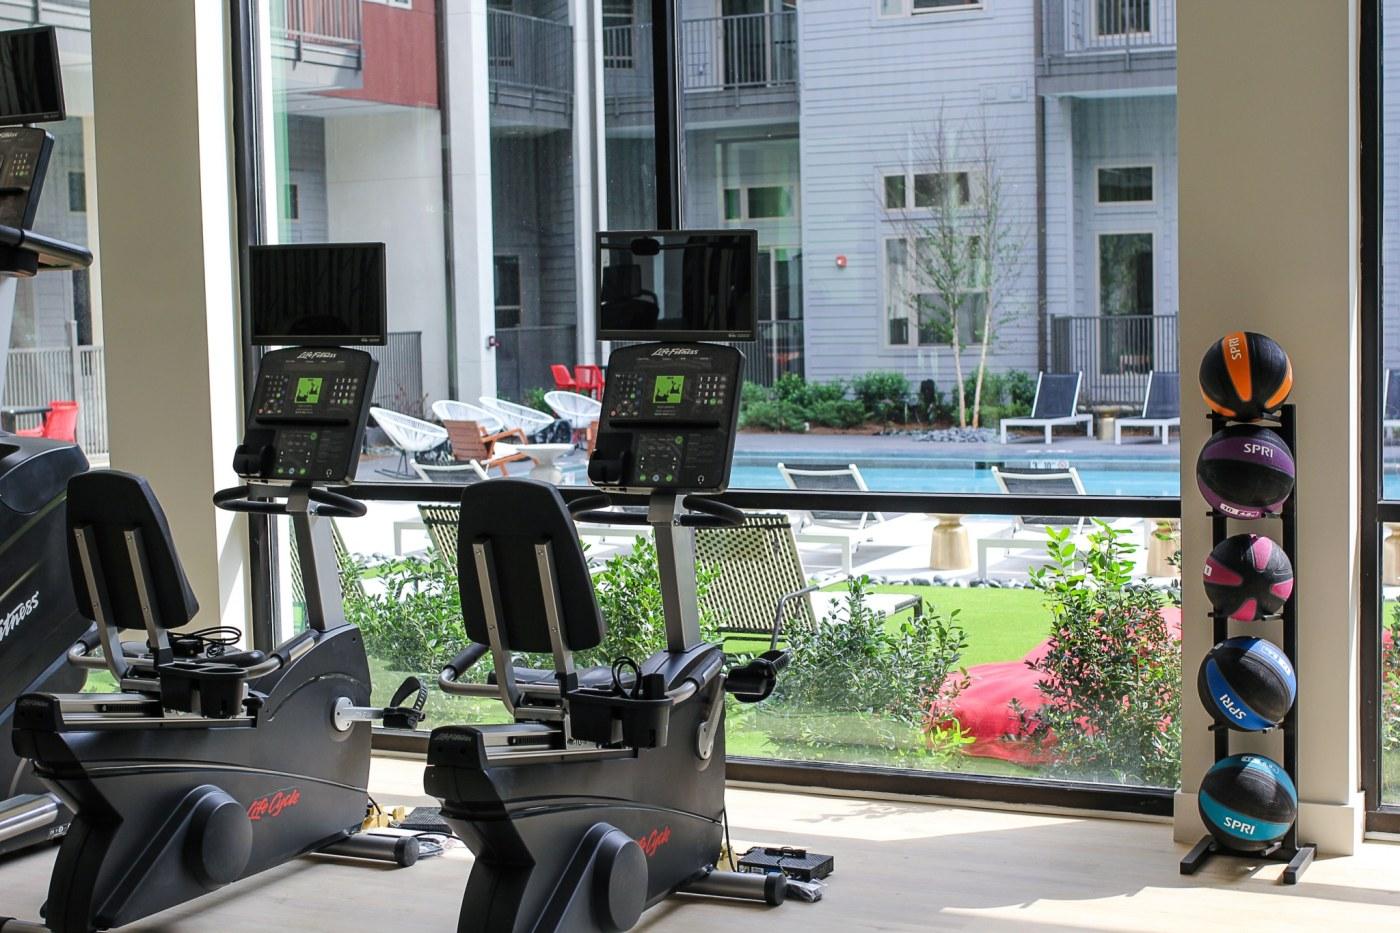 Birmingham, Alabama, The Metropolitan, UAB medical student housing options, fitness center, gym